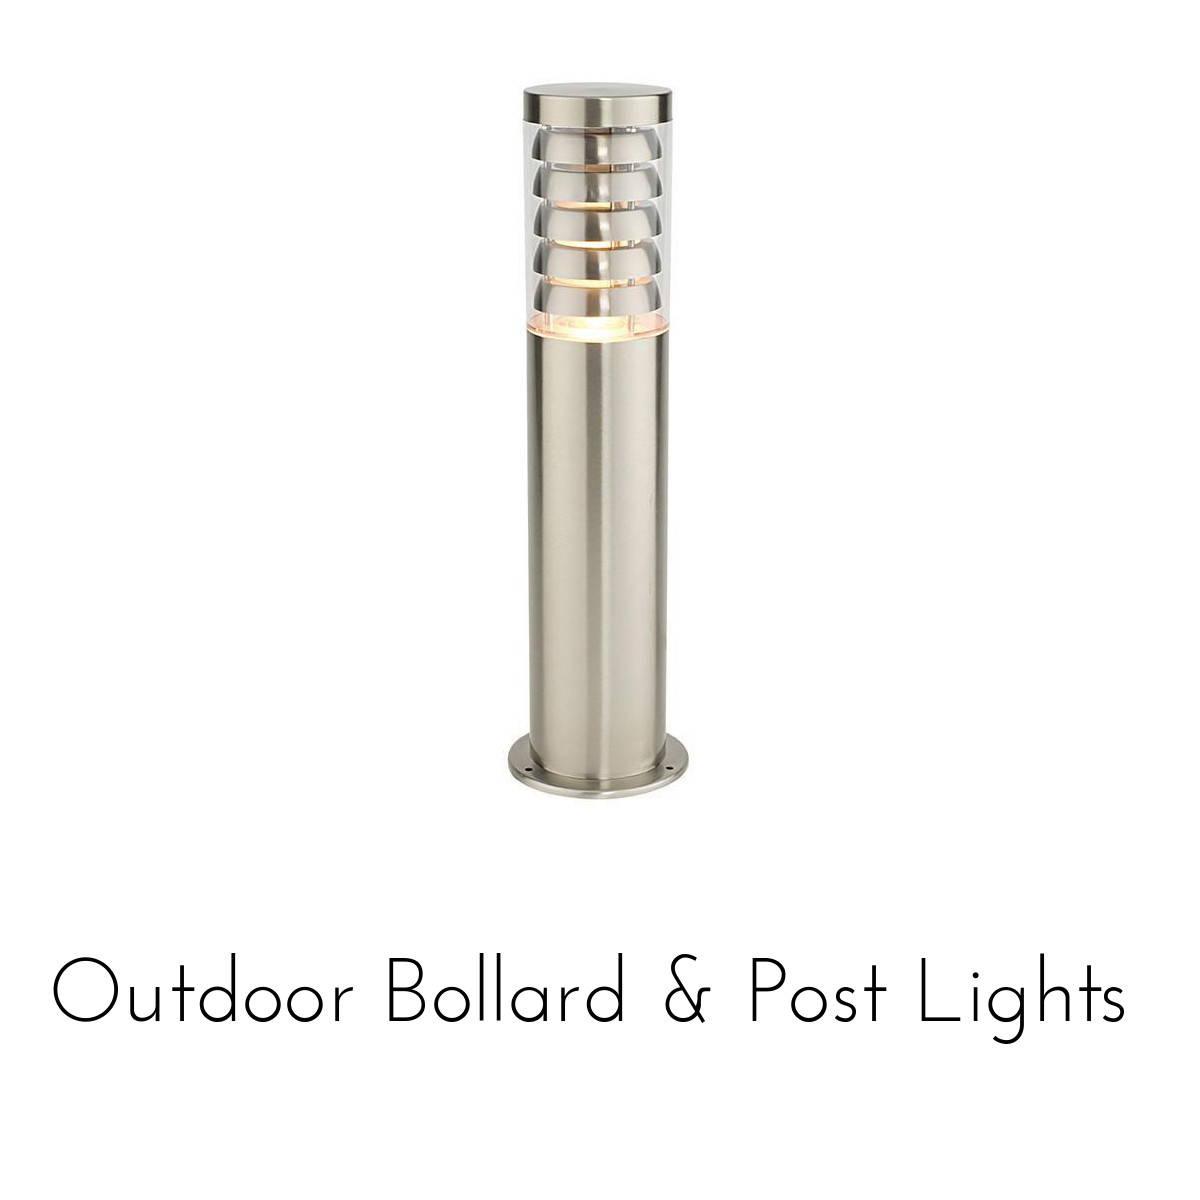 bollard and post lights